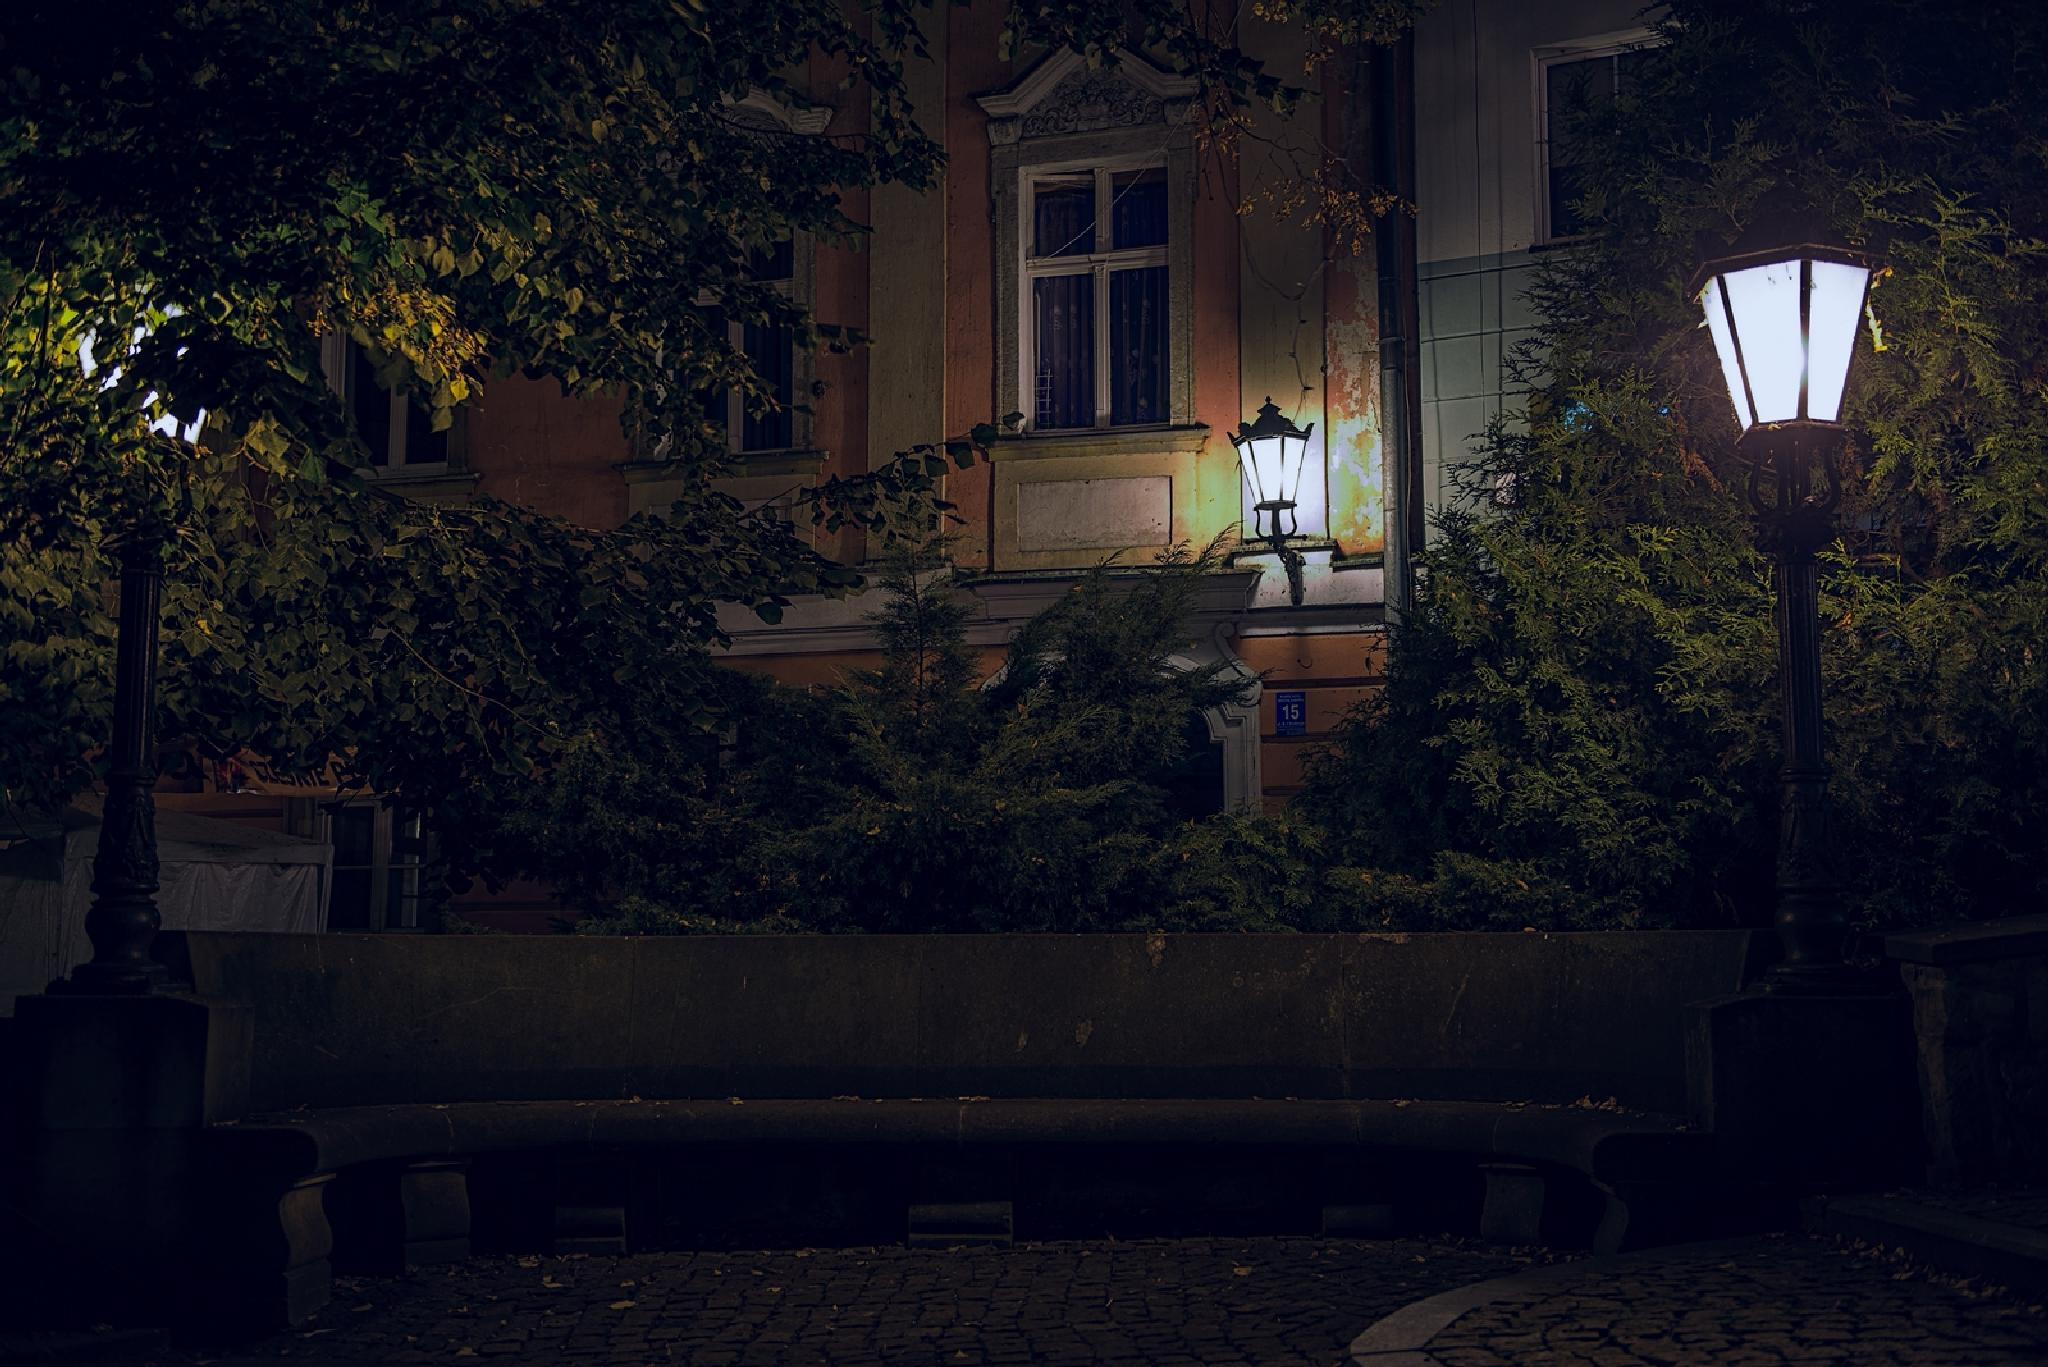 Bench by Waldemar Sadlowski